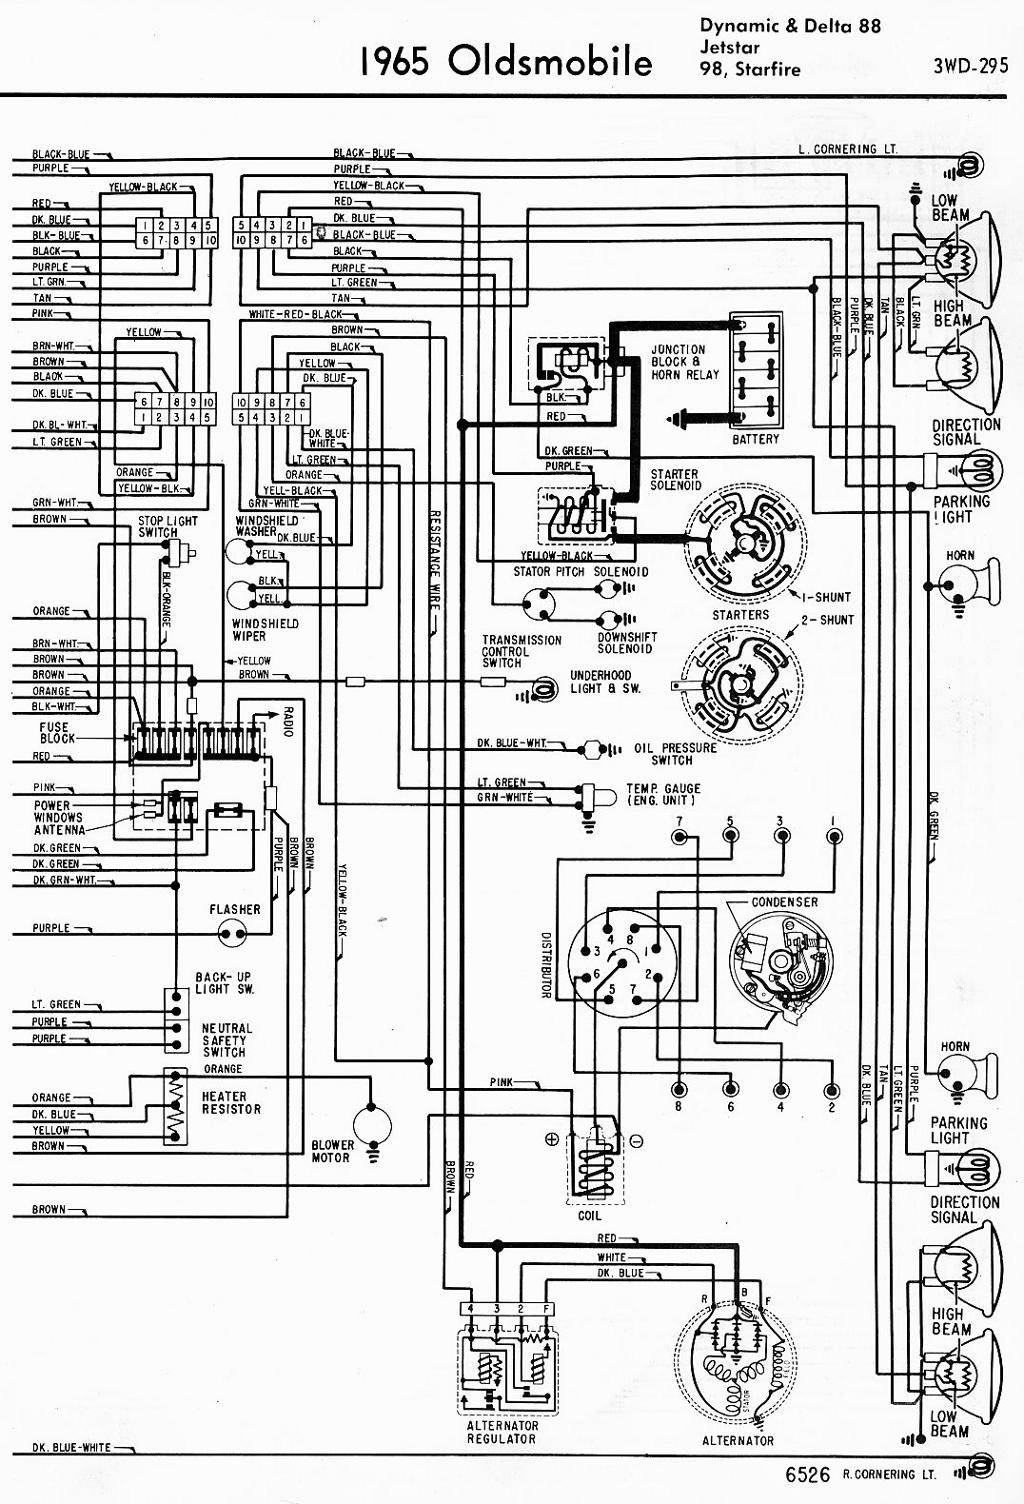 1996 Oldsmobile 88 Wiring Diagram - Wiring Diagram Data on studebaker wiring diagrams, plymouth wiring diagrams, gem wiring diagrams, honda wiring diagrams, excalibur wiring diagrams, imperial wiring diagrams, delorean wiring diagrams, dodge wiring diagrams, chrysler wiring diagrams, mini cooper wiring diagrams, jeep wiring diagrams, mitsubishi wiring diagrams, triumph wiring diagrams, alfa romeo wiring diagrams, ktm wiring diagrams, gm wiring diagrams, viking wiring diagrams, austin healey wiring diagrams, lincoln wiring diagrams, international wiring diagrams,